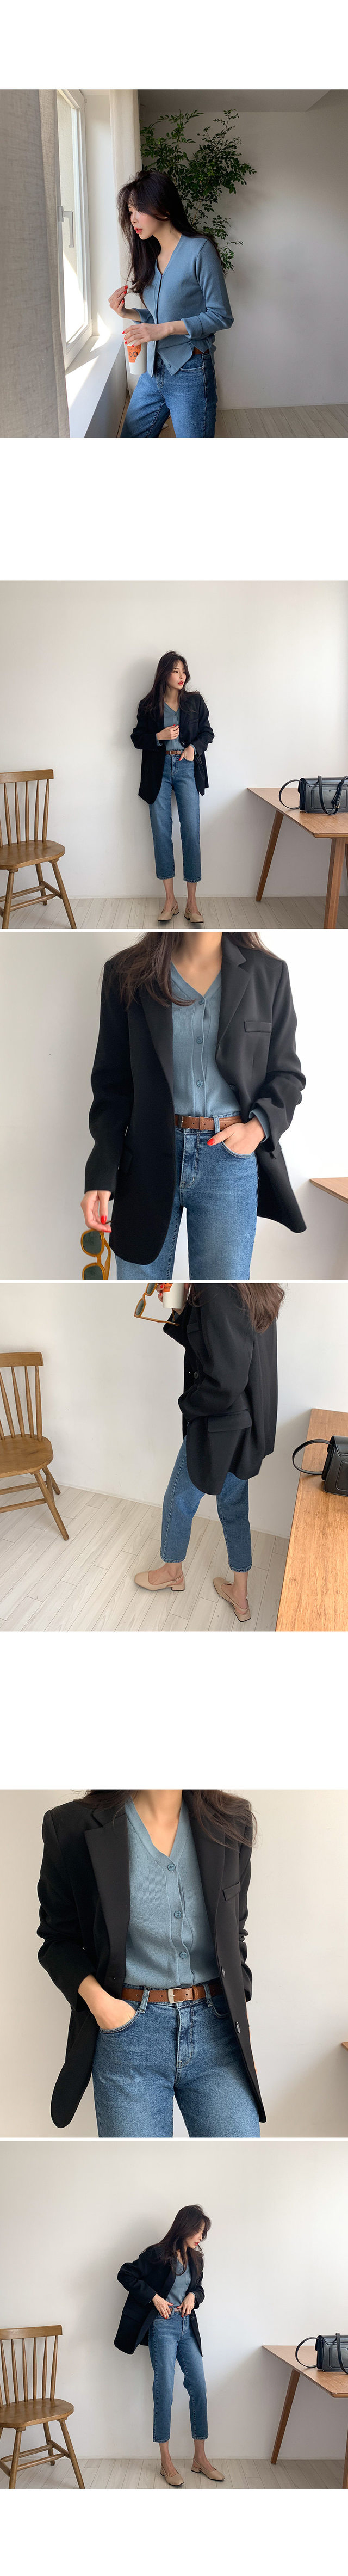 Second Single Jacket